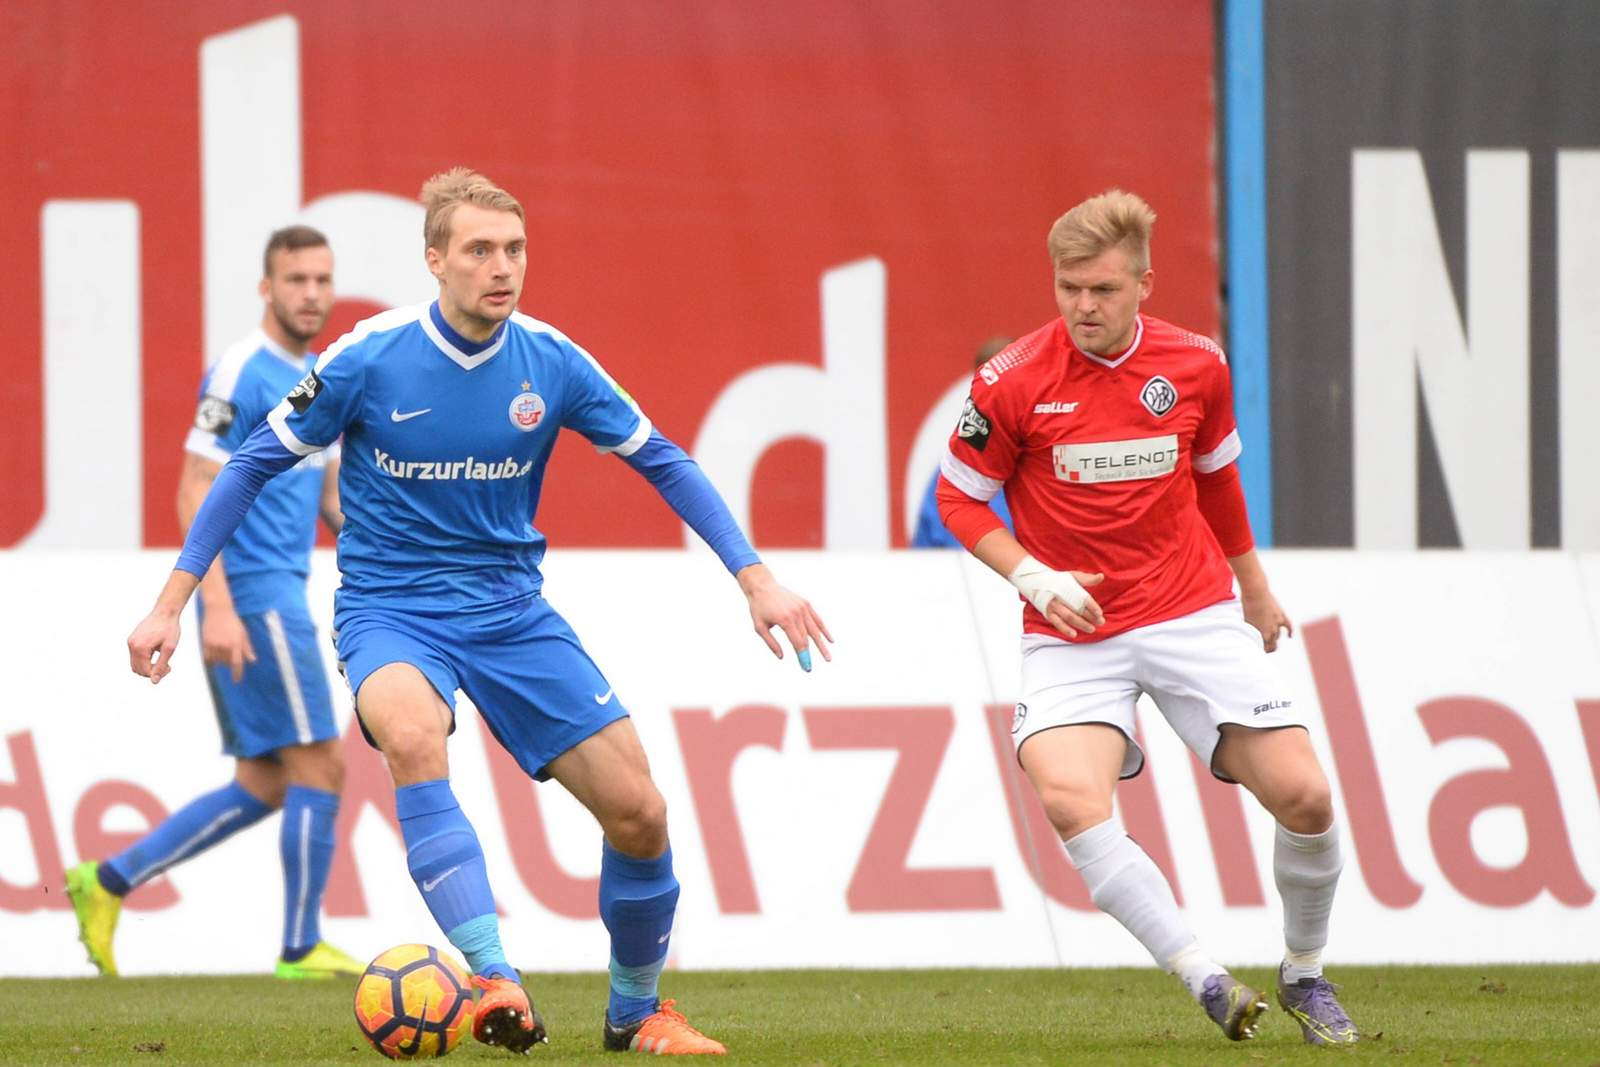 Tim Väyrynen vom FC Hansa Rostock am Ball.